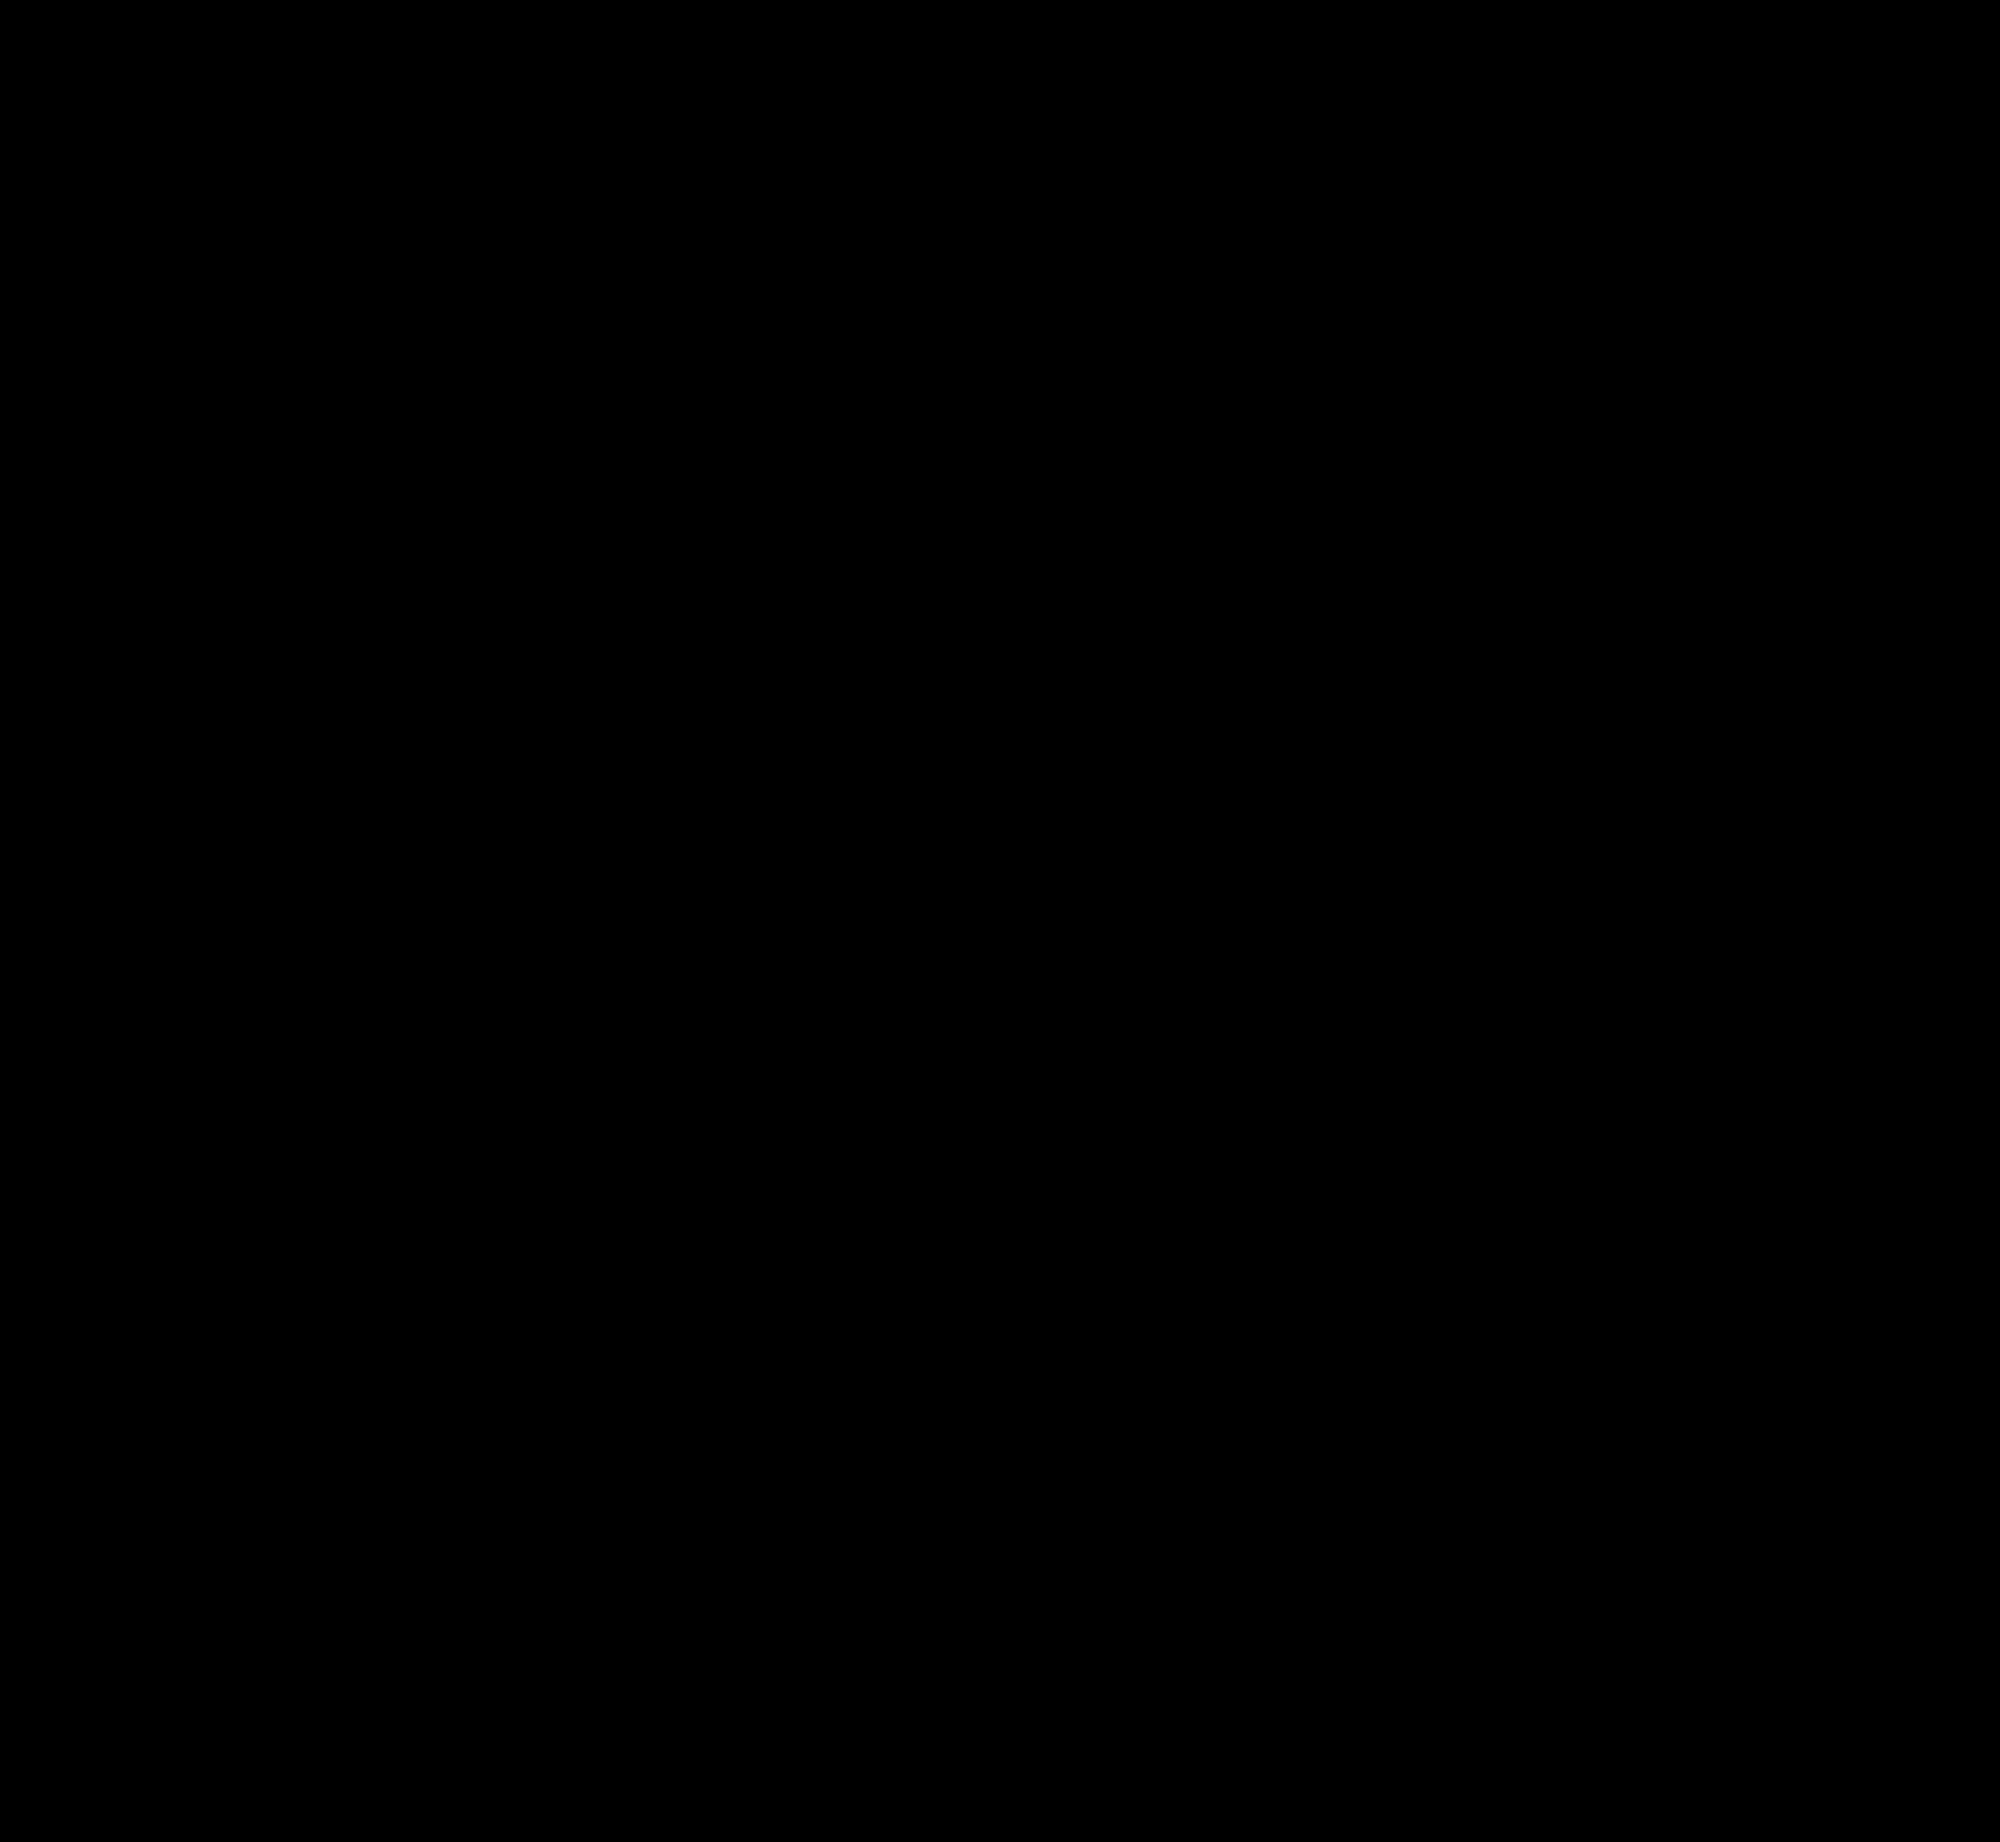 Rockit-logo-black.png